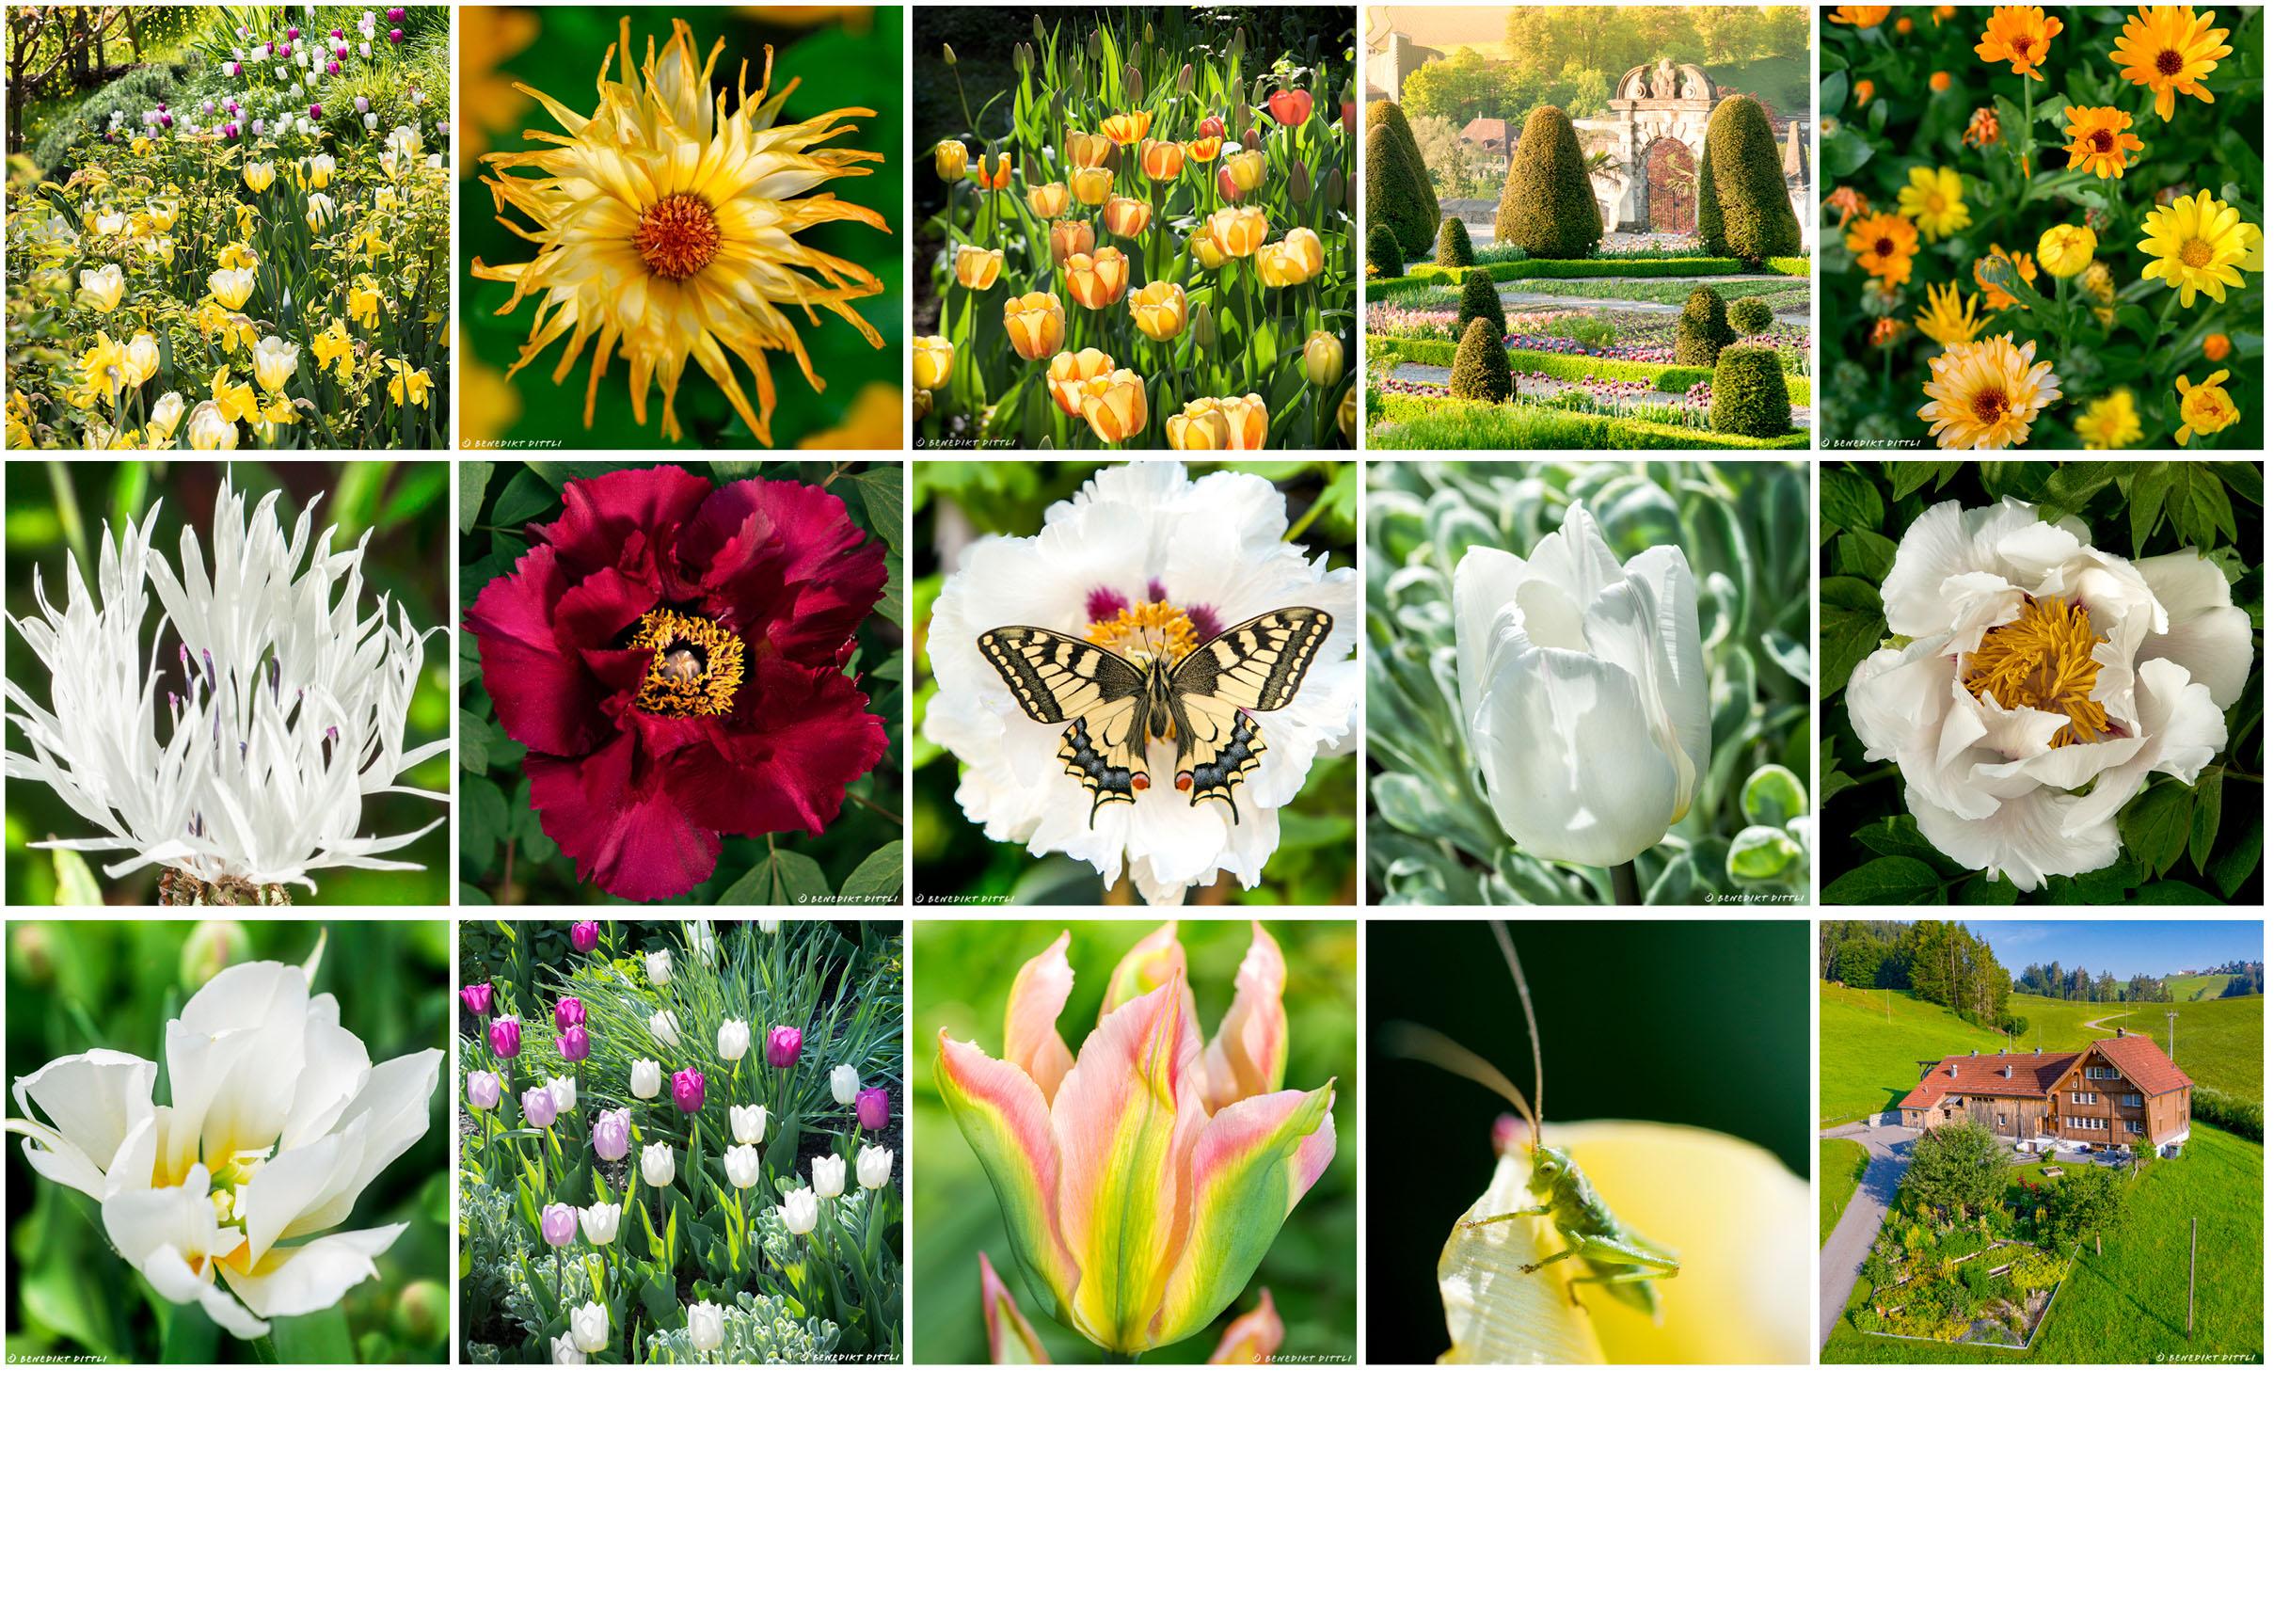 Gartenfotografie, Gartenfotograf, Porträtfotografie, Porträtfotograf, Fotograf, Fotografie, Werbefoto, Werbefotograf, Fotoproduktion, Interiorfotograf, Interiourfotografie, professioneller Fotograf,